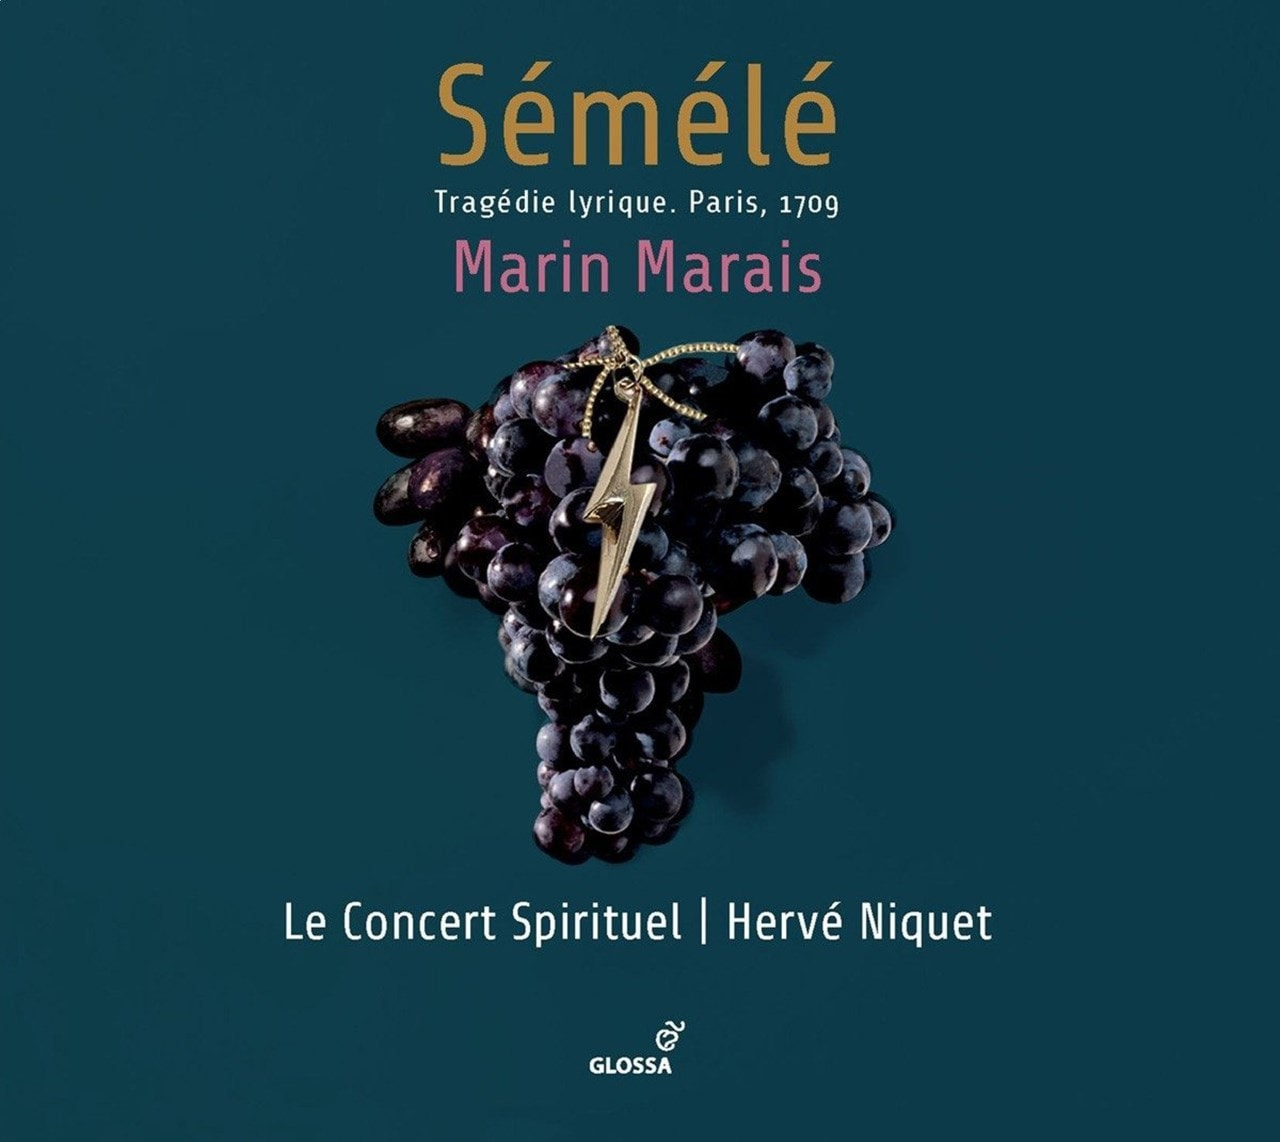 Marin Marais: Semele - 1